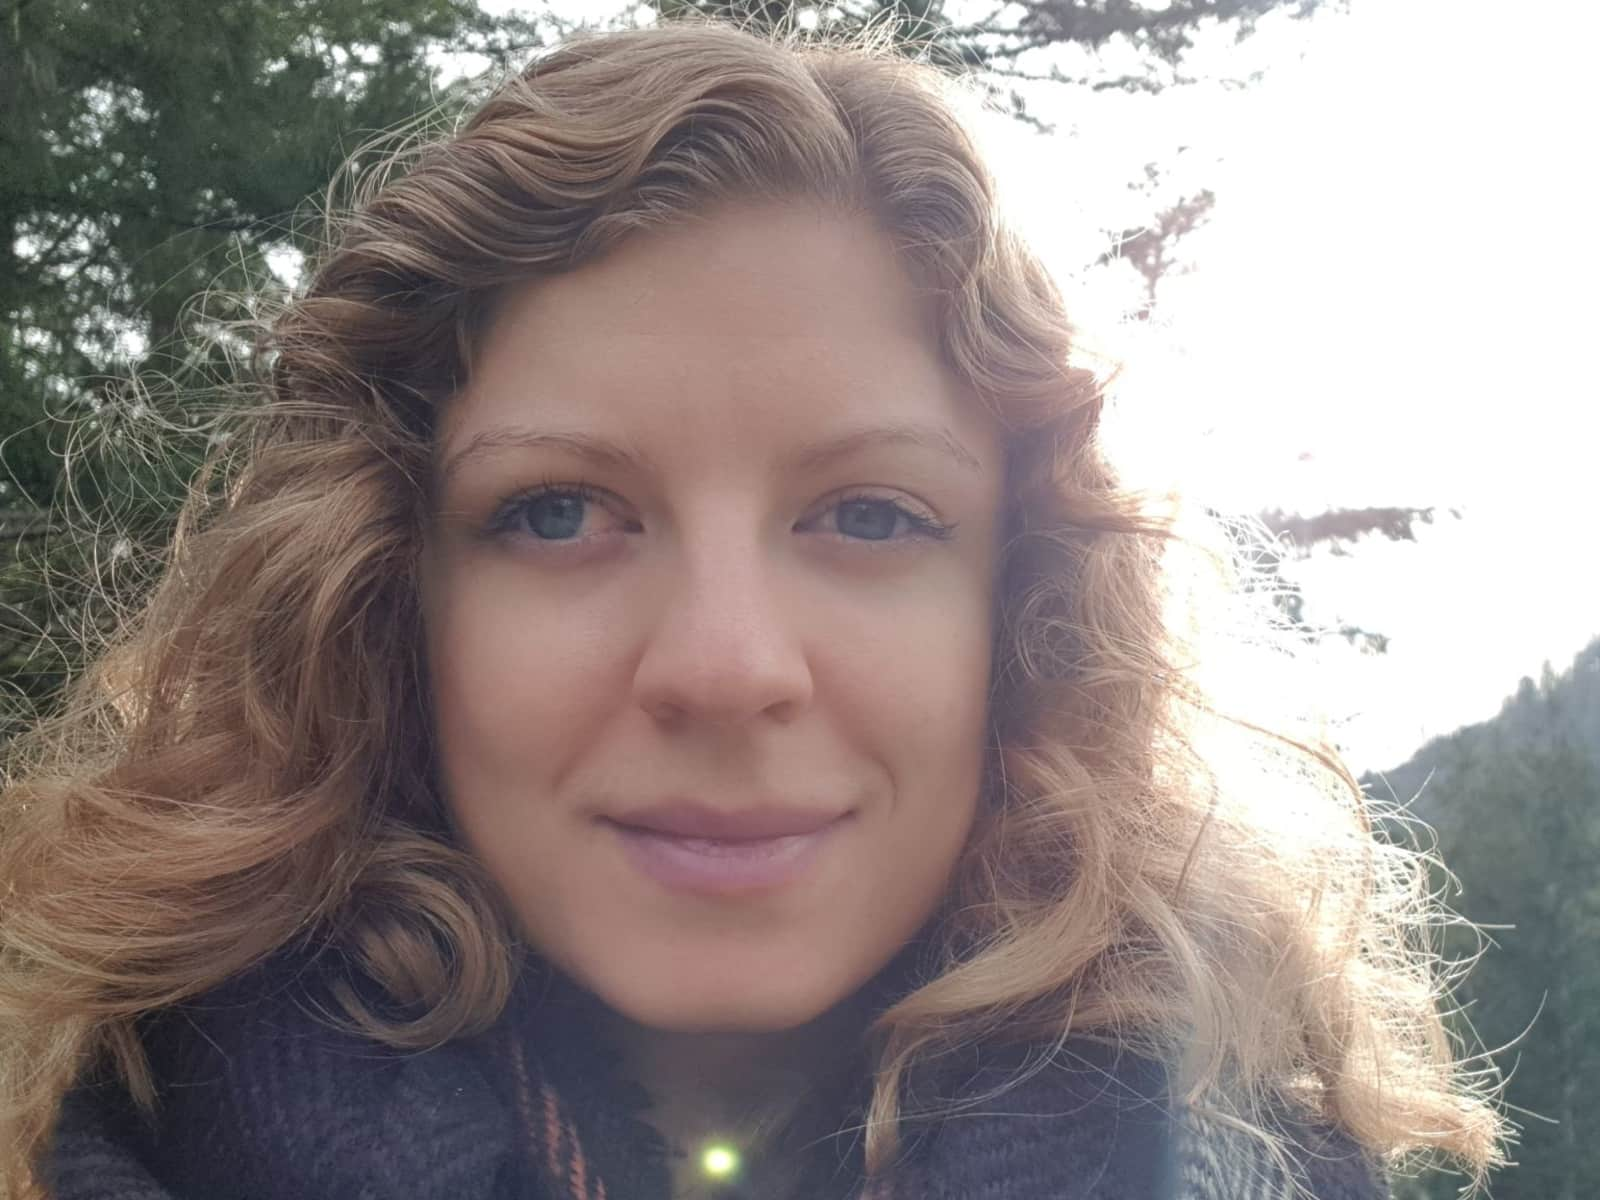 Caroline from Vancouver, British Columbia, Canada